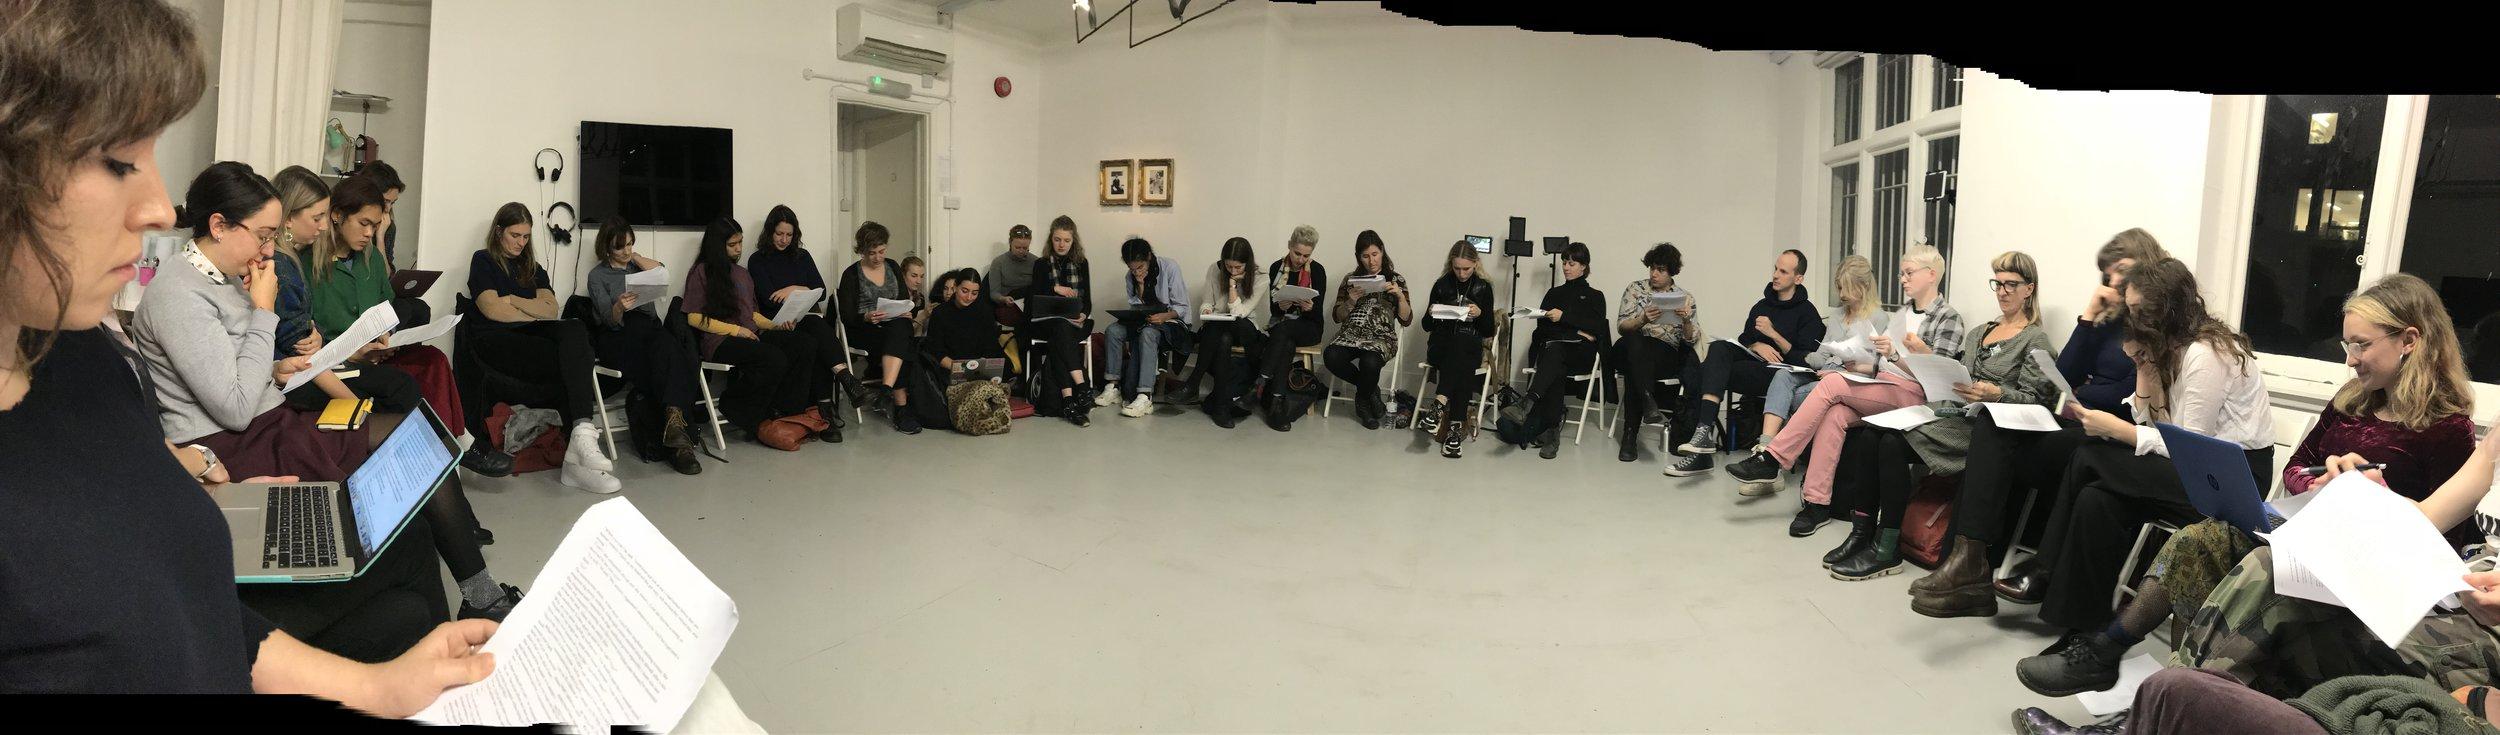 Khariani Barokka & Octavia Butler, Feminist Duration Reading Group, Mimosa House, London, Dec 2018. Photo Helena Reckitt.